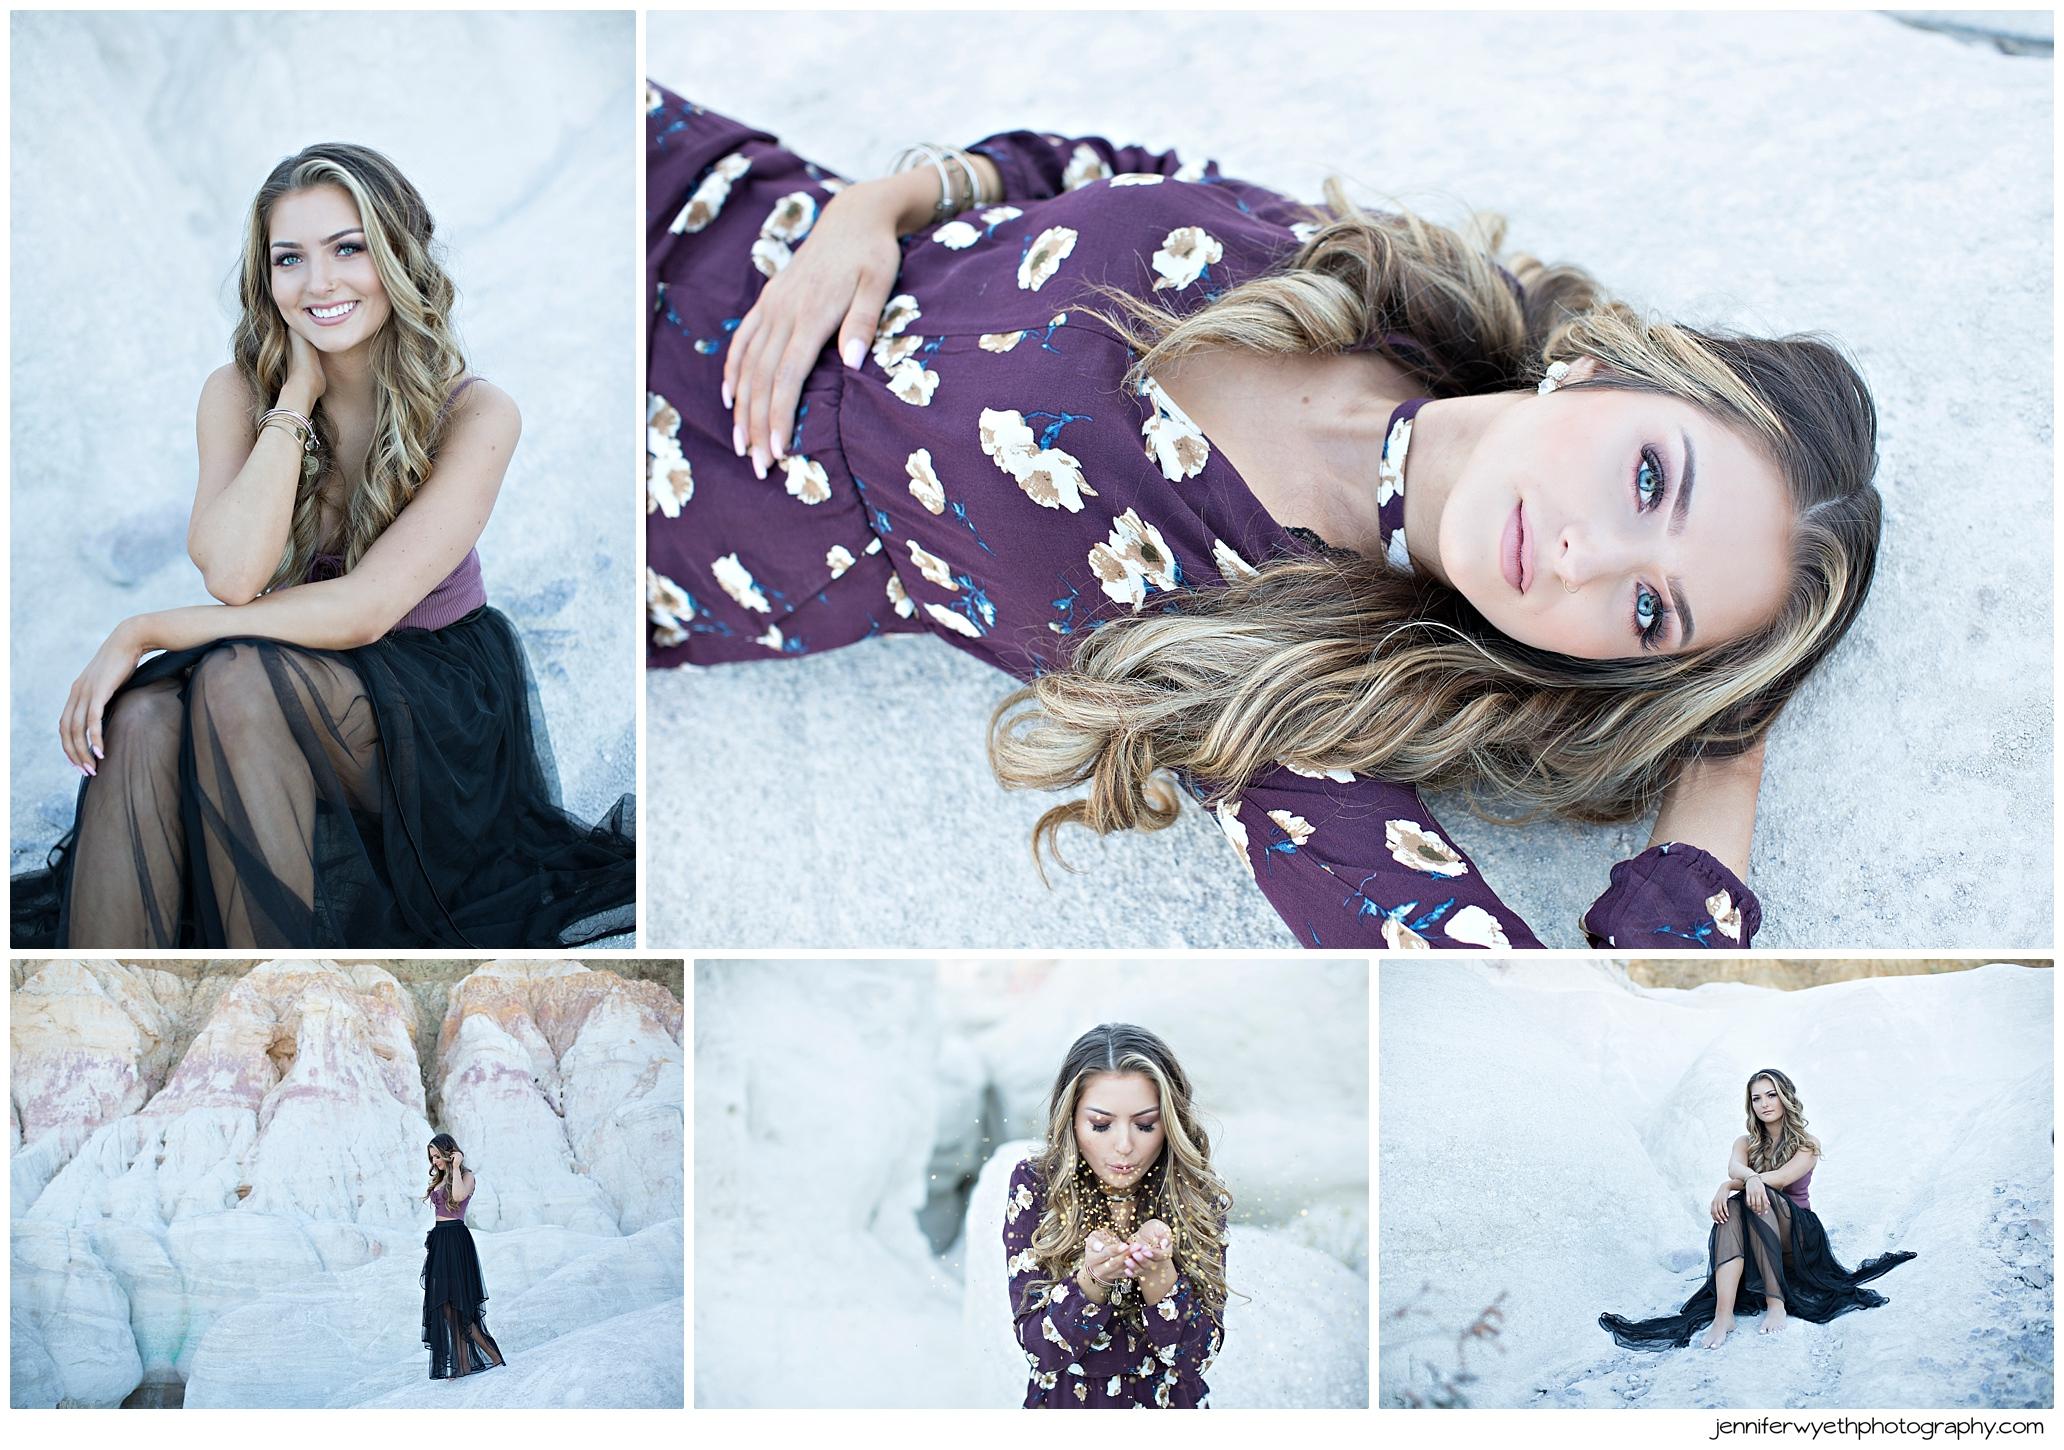 Jennifer-Wyeth-photography-senior-pictures-colorado-springs-photographer_0202.jpg